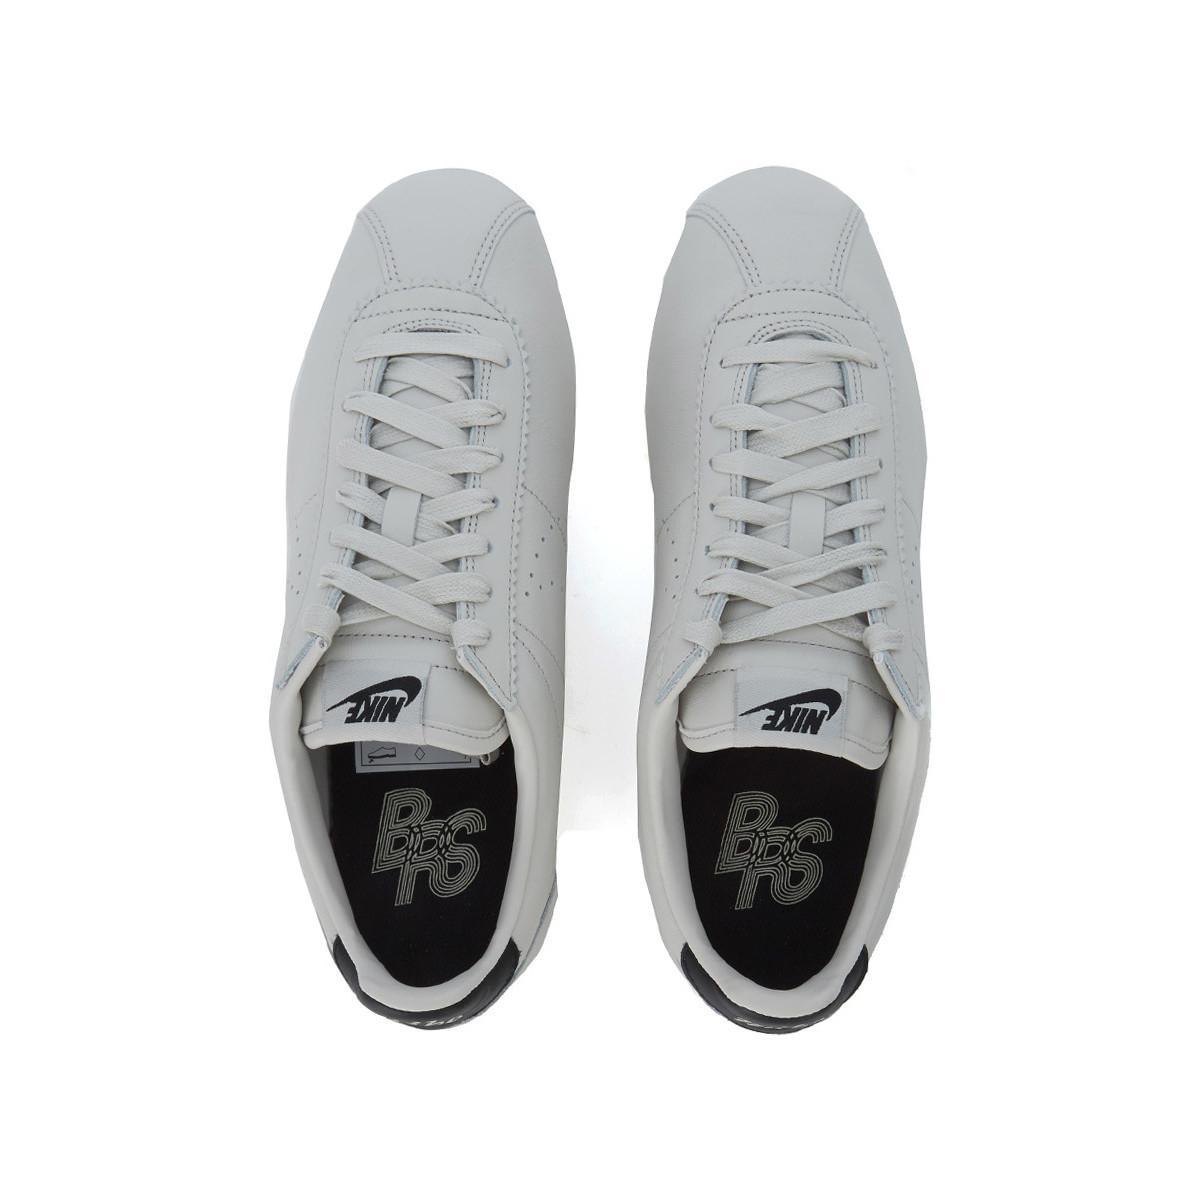 aliexpress nike classic cortez nylon light gray bianca 399a2